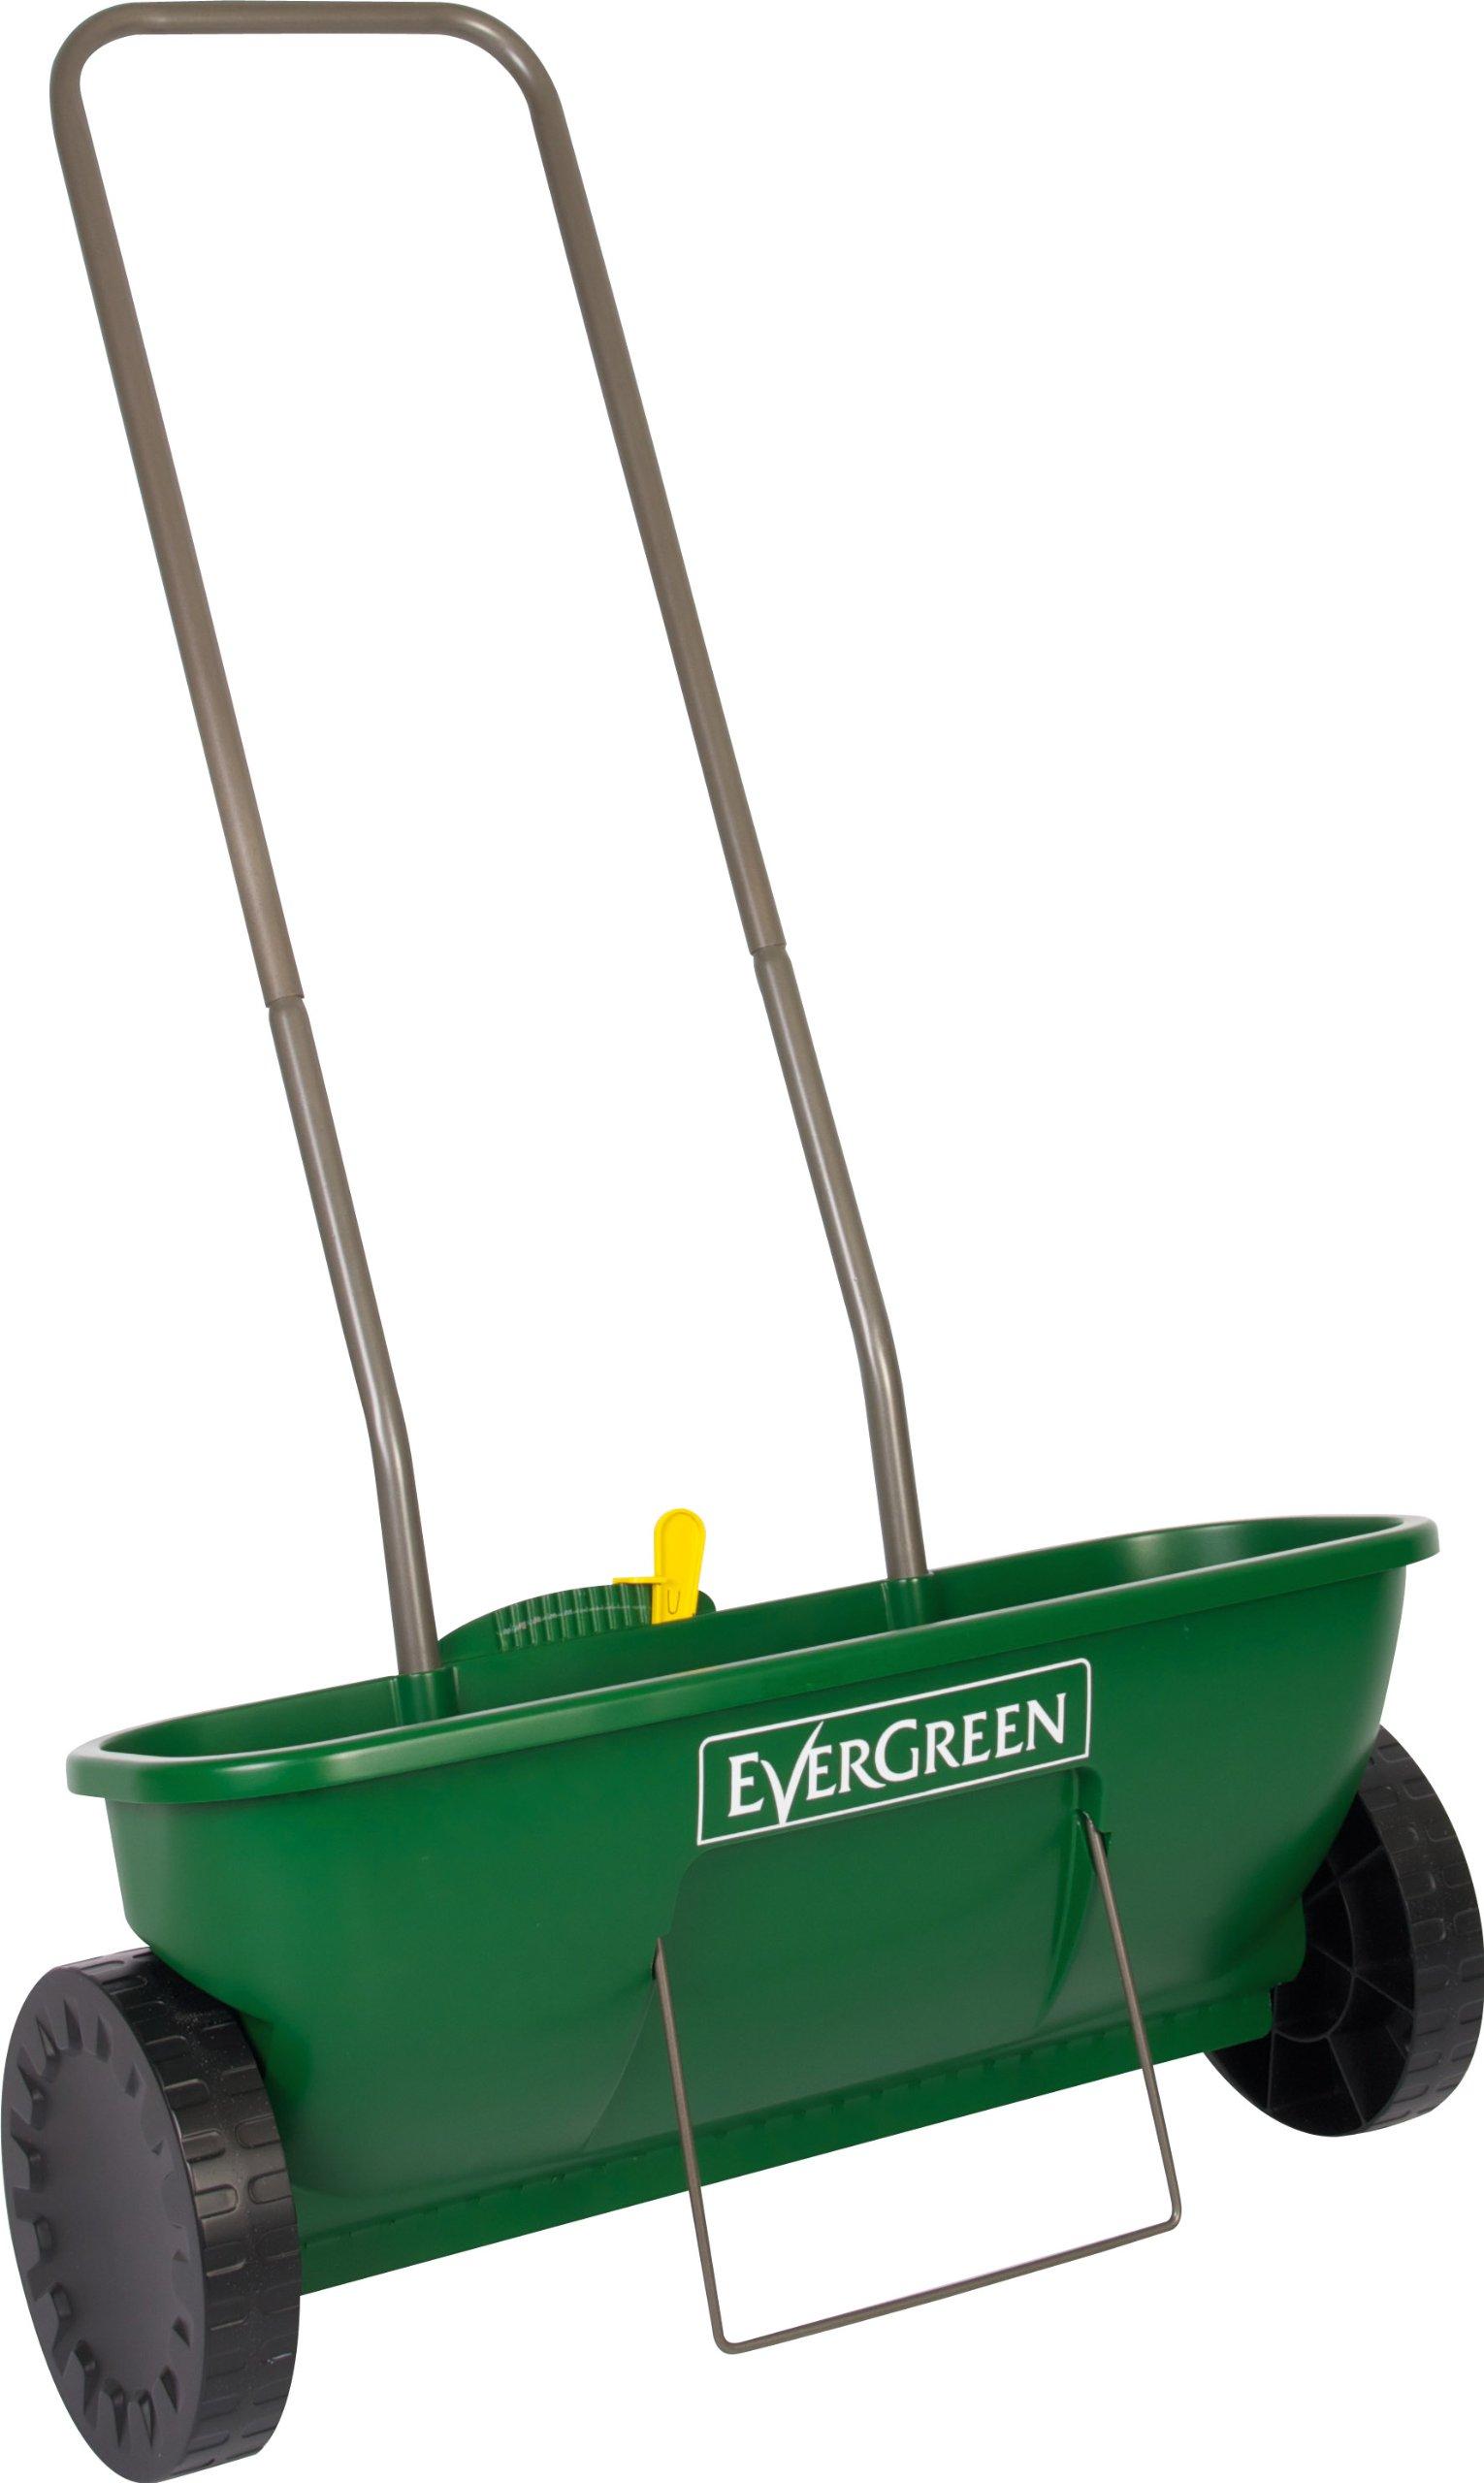 outdoor spreader evergreen easy drop feed plus garden lawn. Black Bedroom Furniture Sets. Home Design Ideas